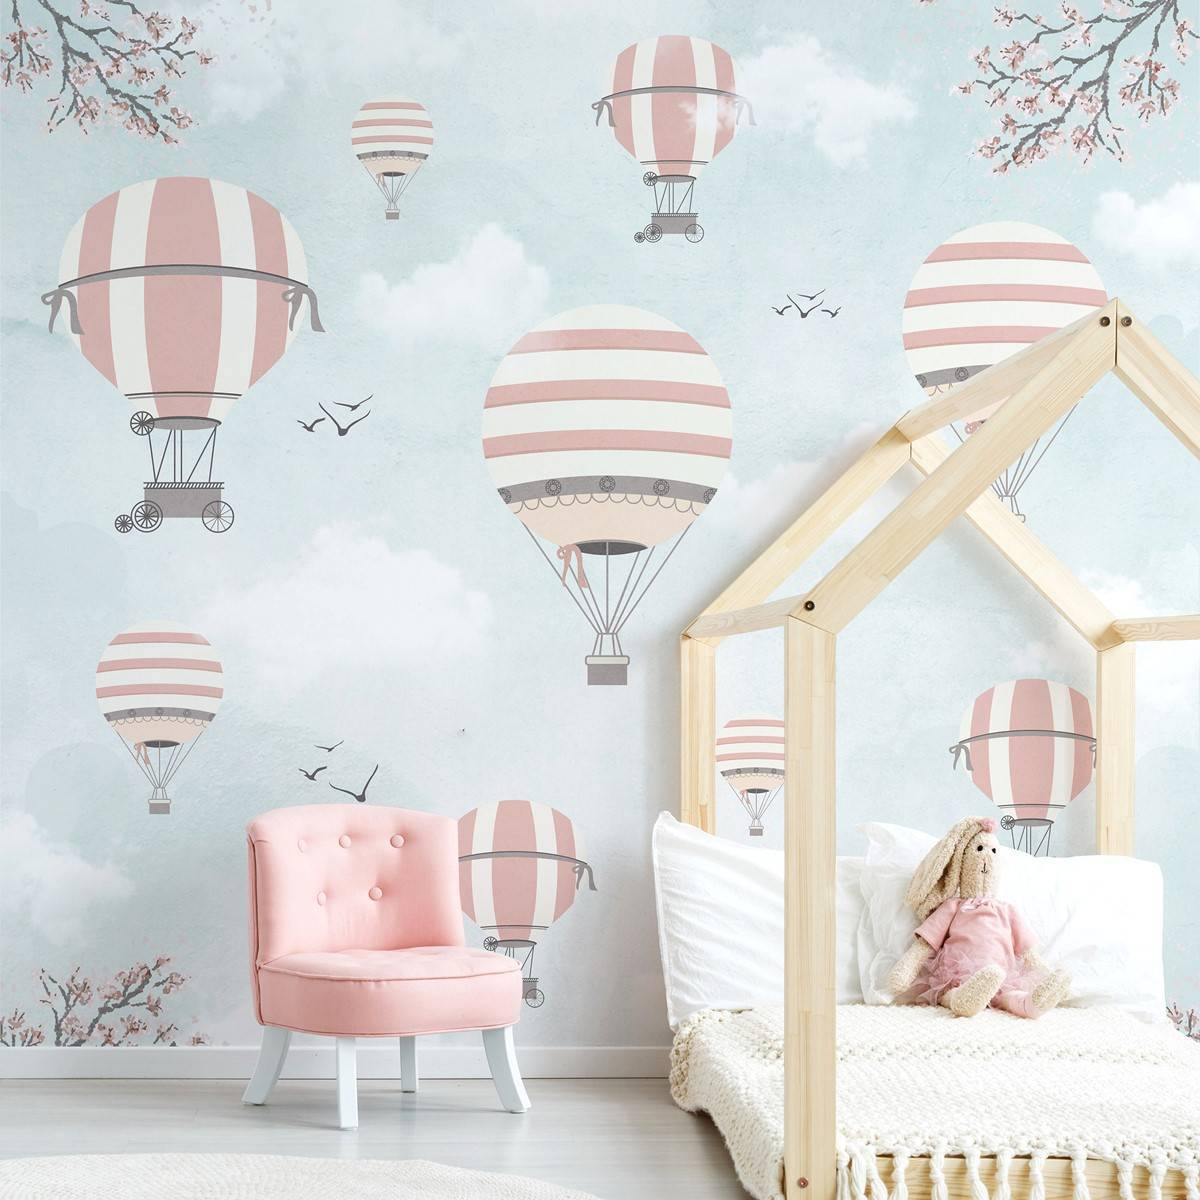 Painel Fotográfico Infantil Lúdico Balões Rosa e Cinza / m² imagem 1